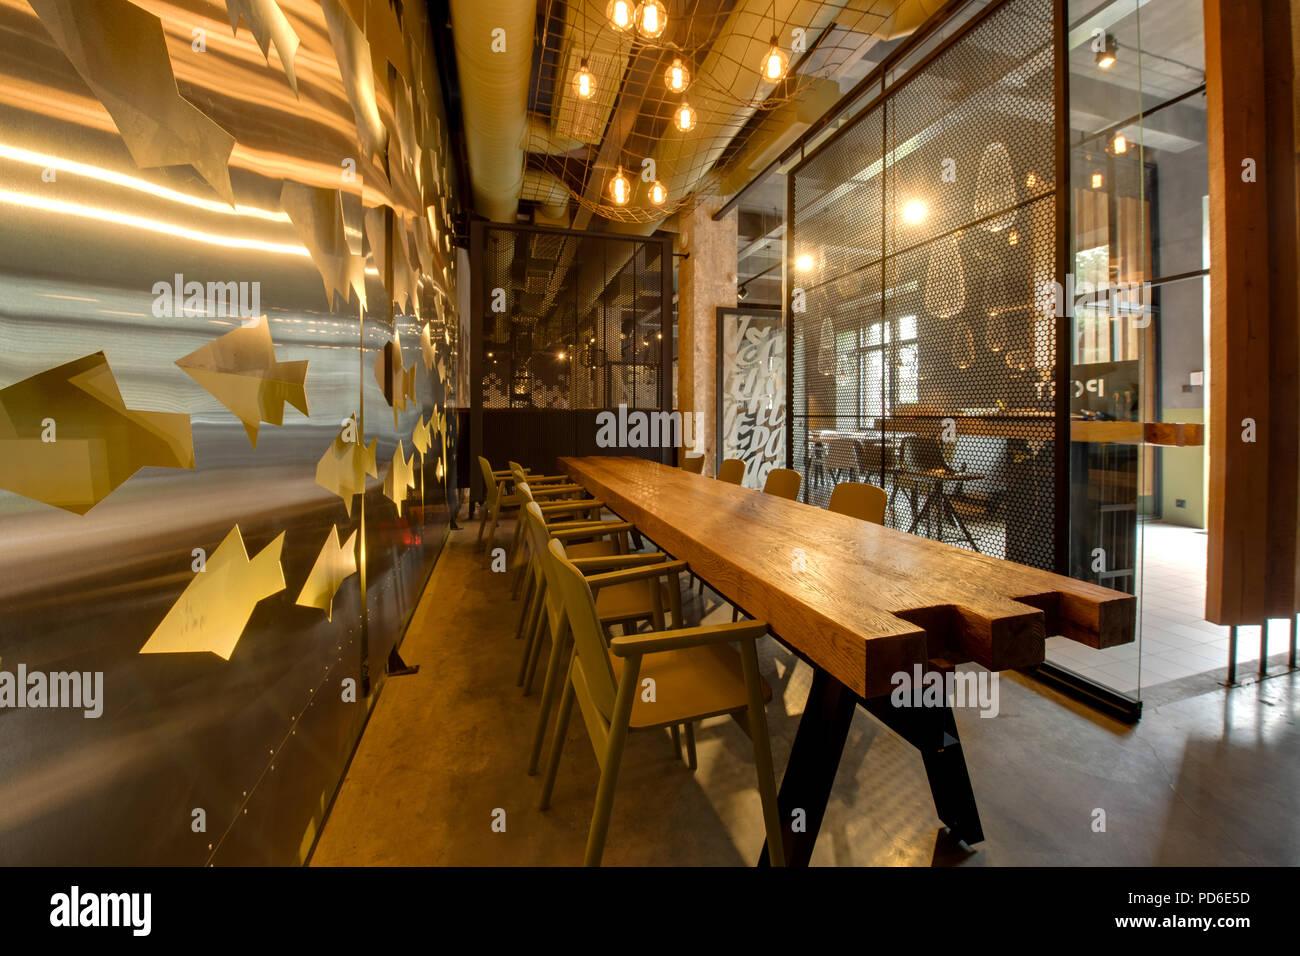 Saint-Petersburg Restoran Balık: yorum